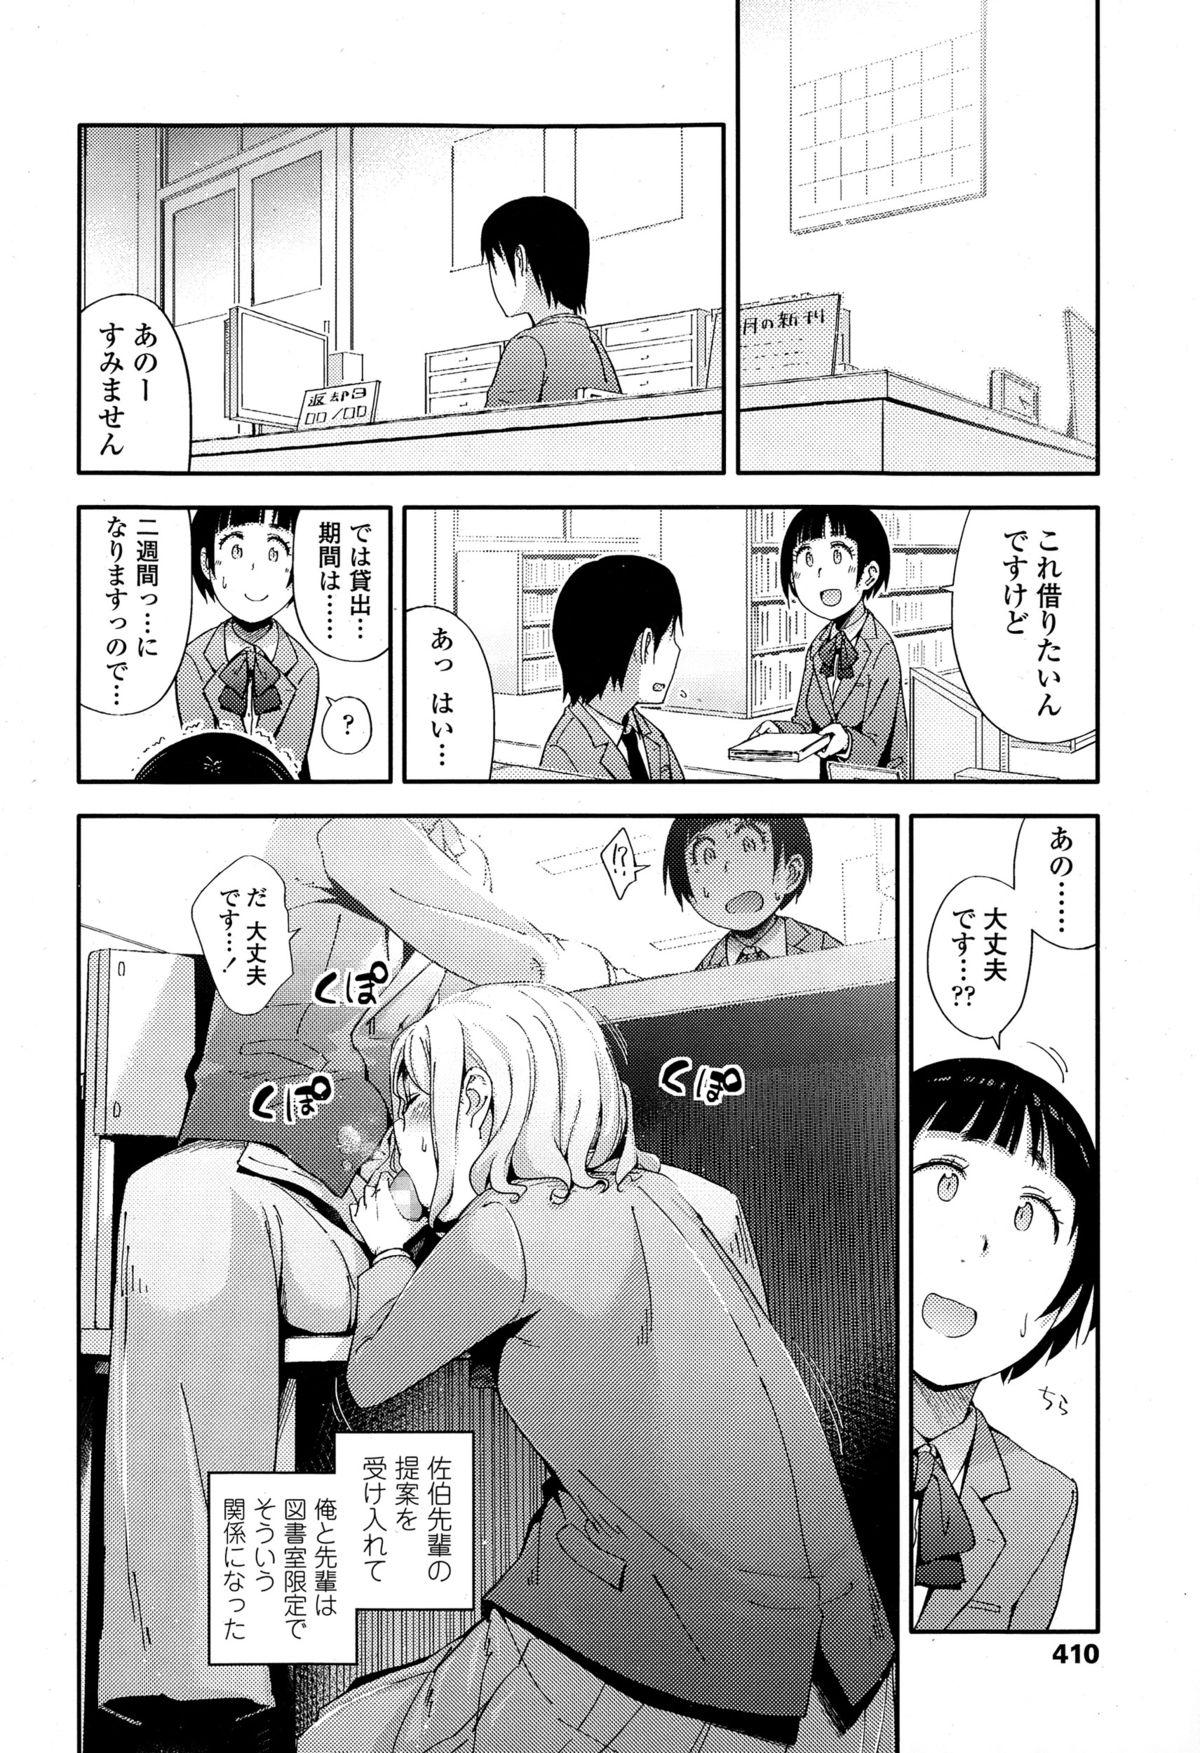 COMIC Koh Vol.4 411